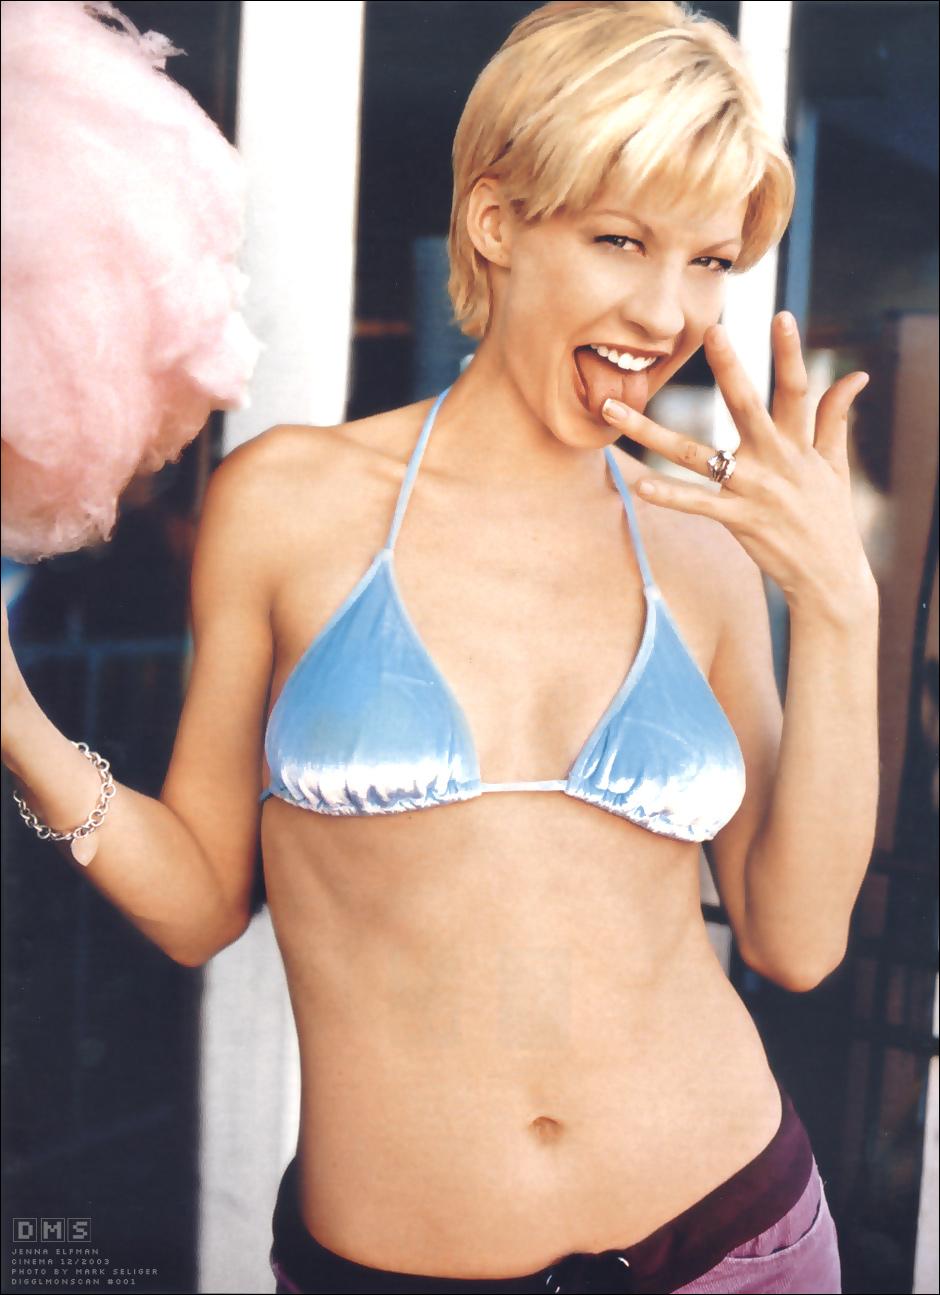 Jenna Elfman photo gallery - 79 high quality pics of Jenna Elfman ... Miranda Kerr